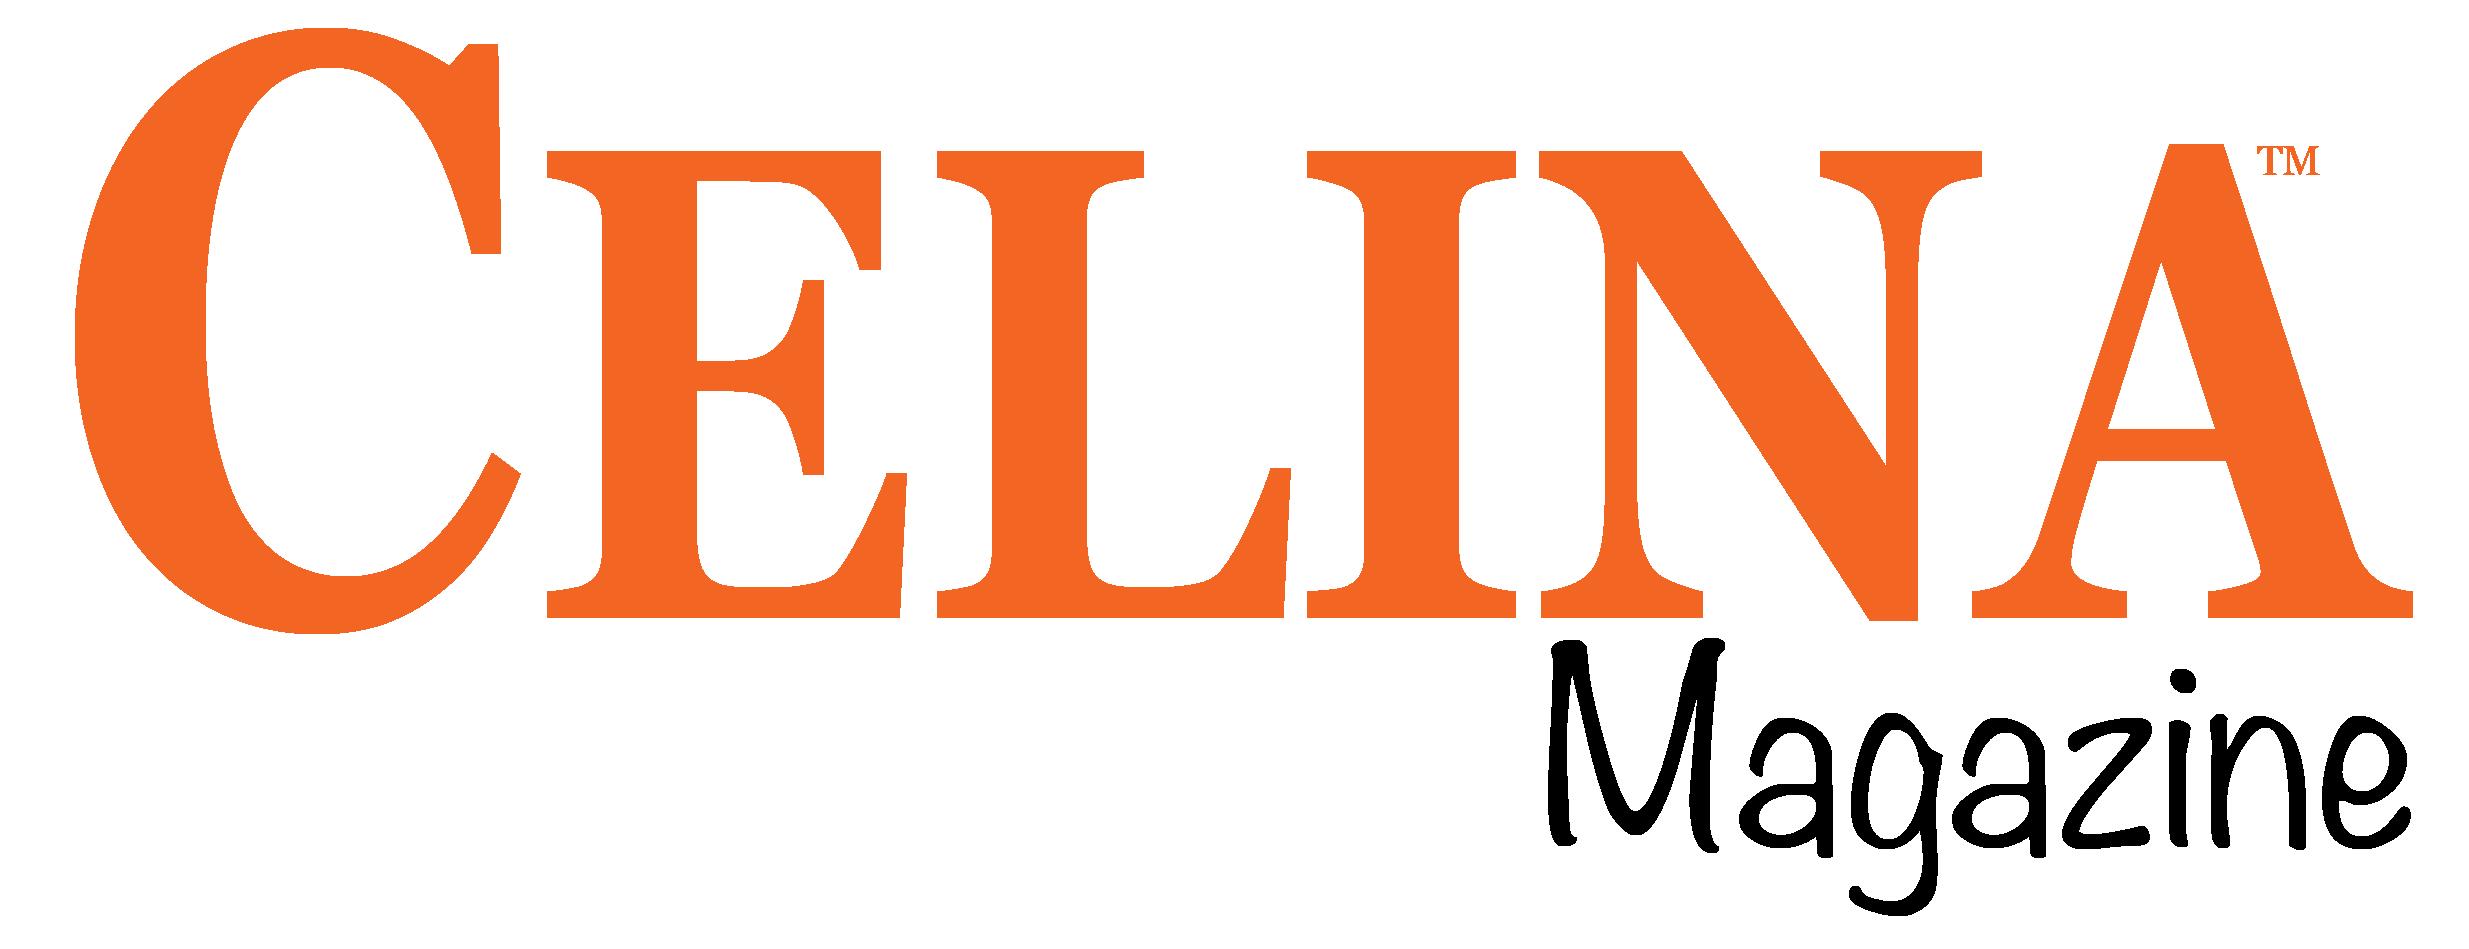 CELINA Magazine